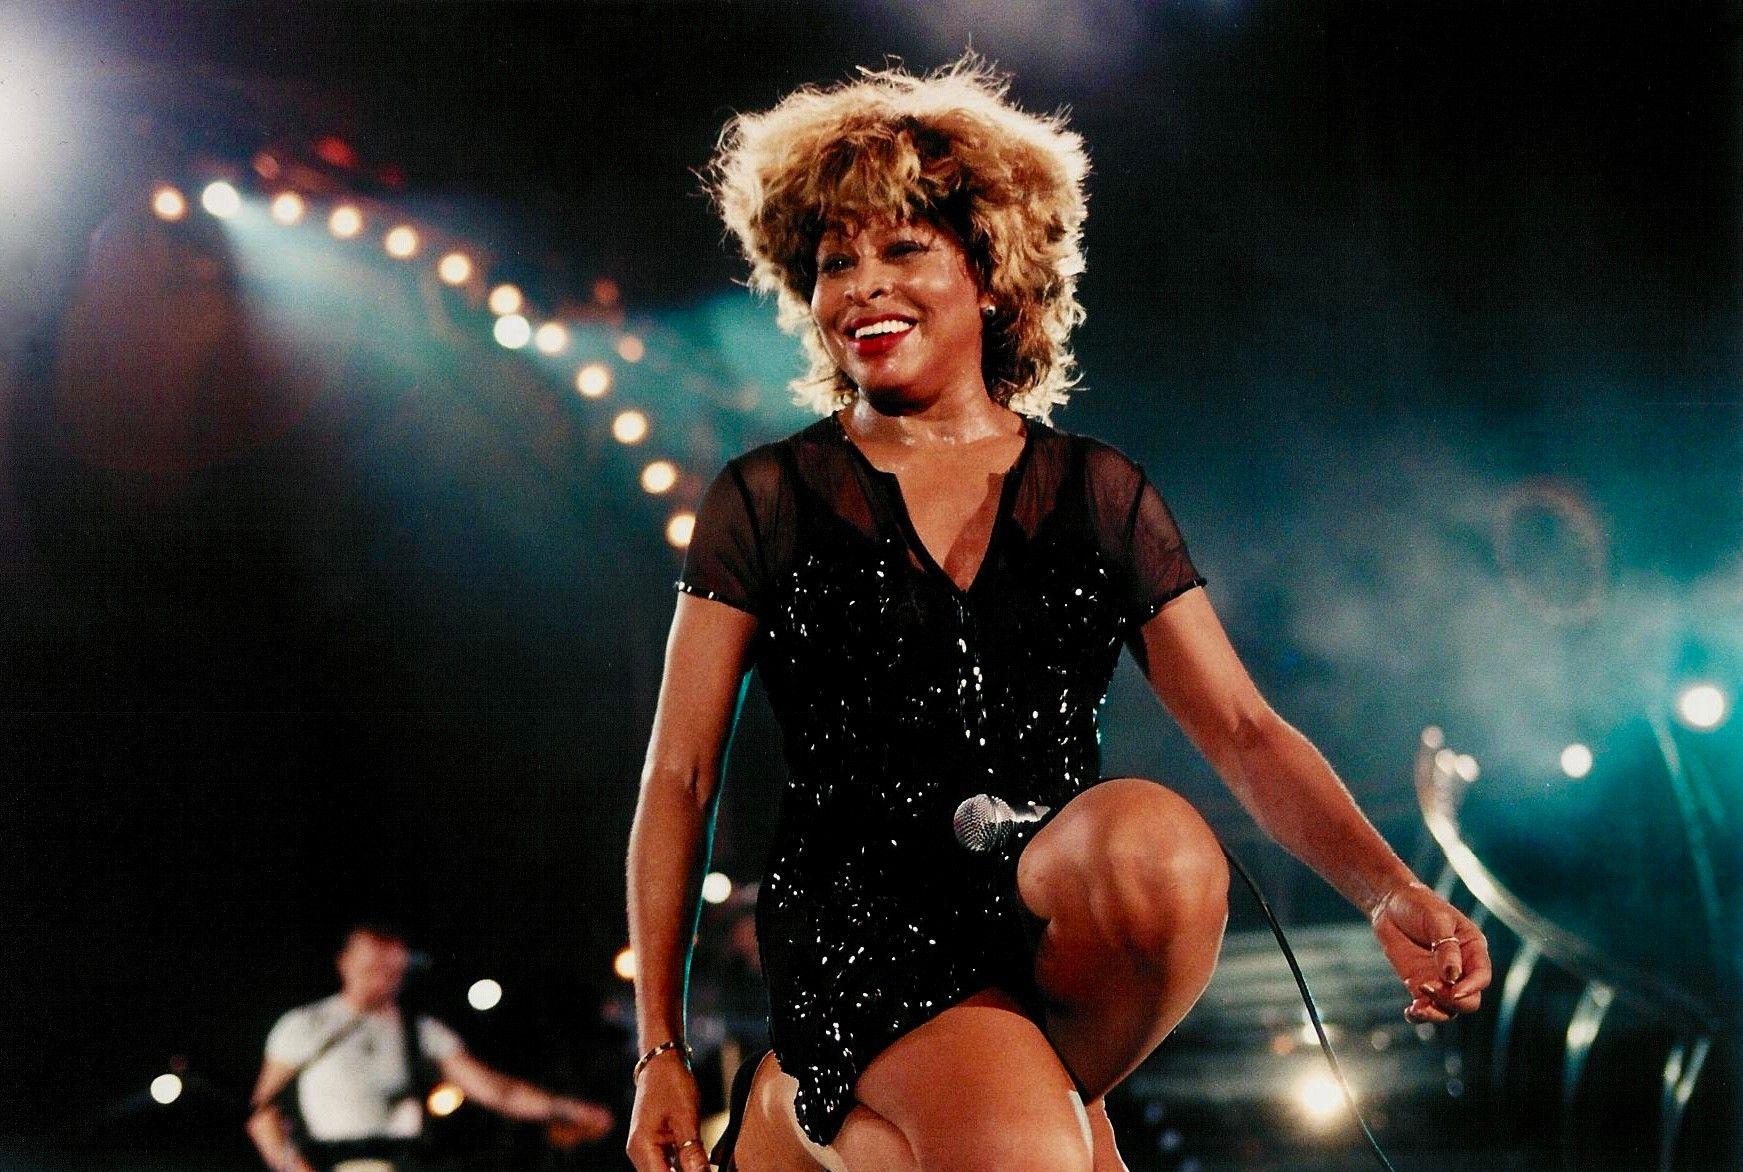 Tina Turner durante un concierto en Londres / Gira Wildest Dreams 1996